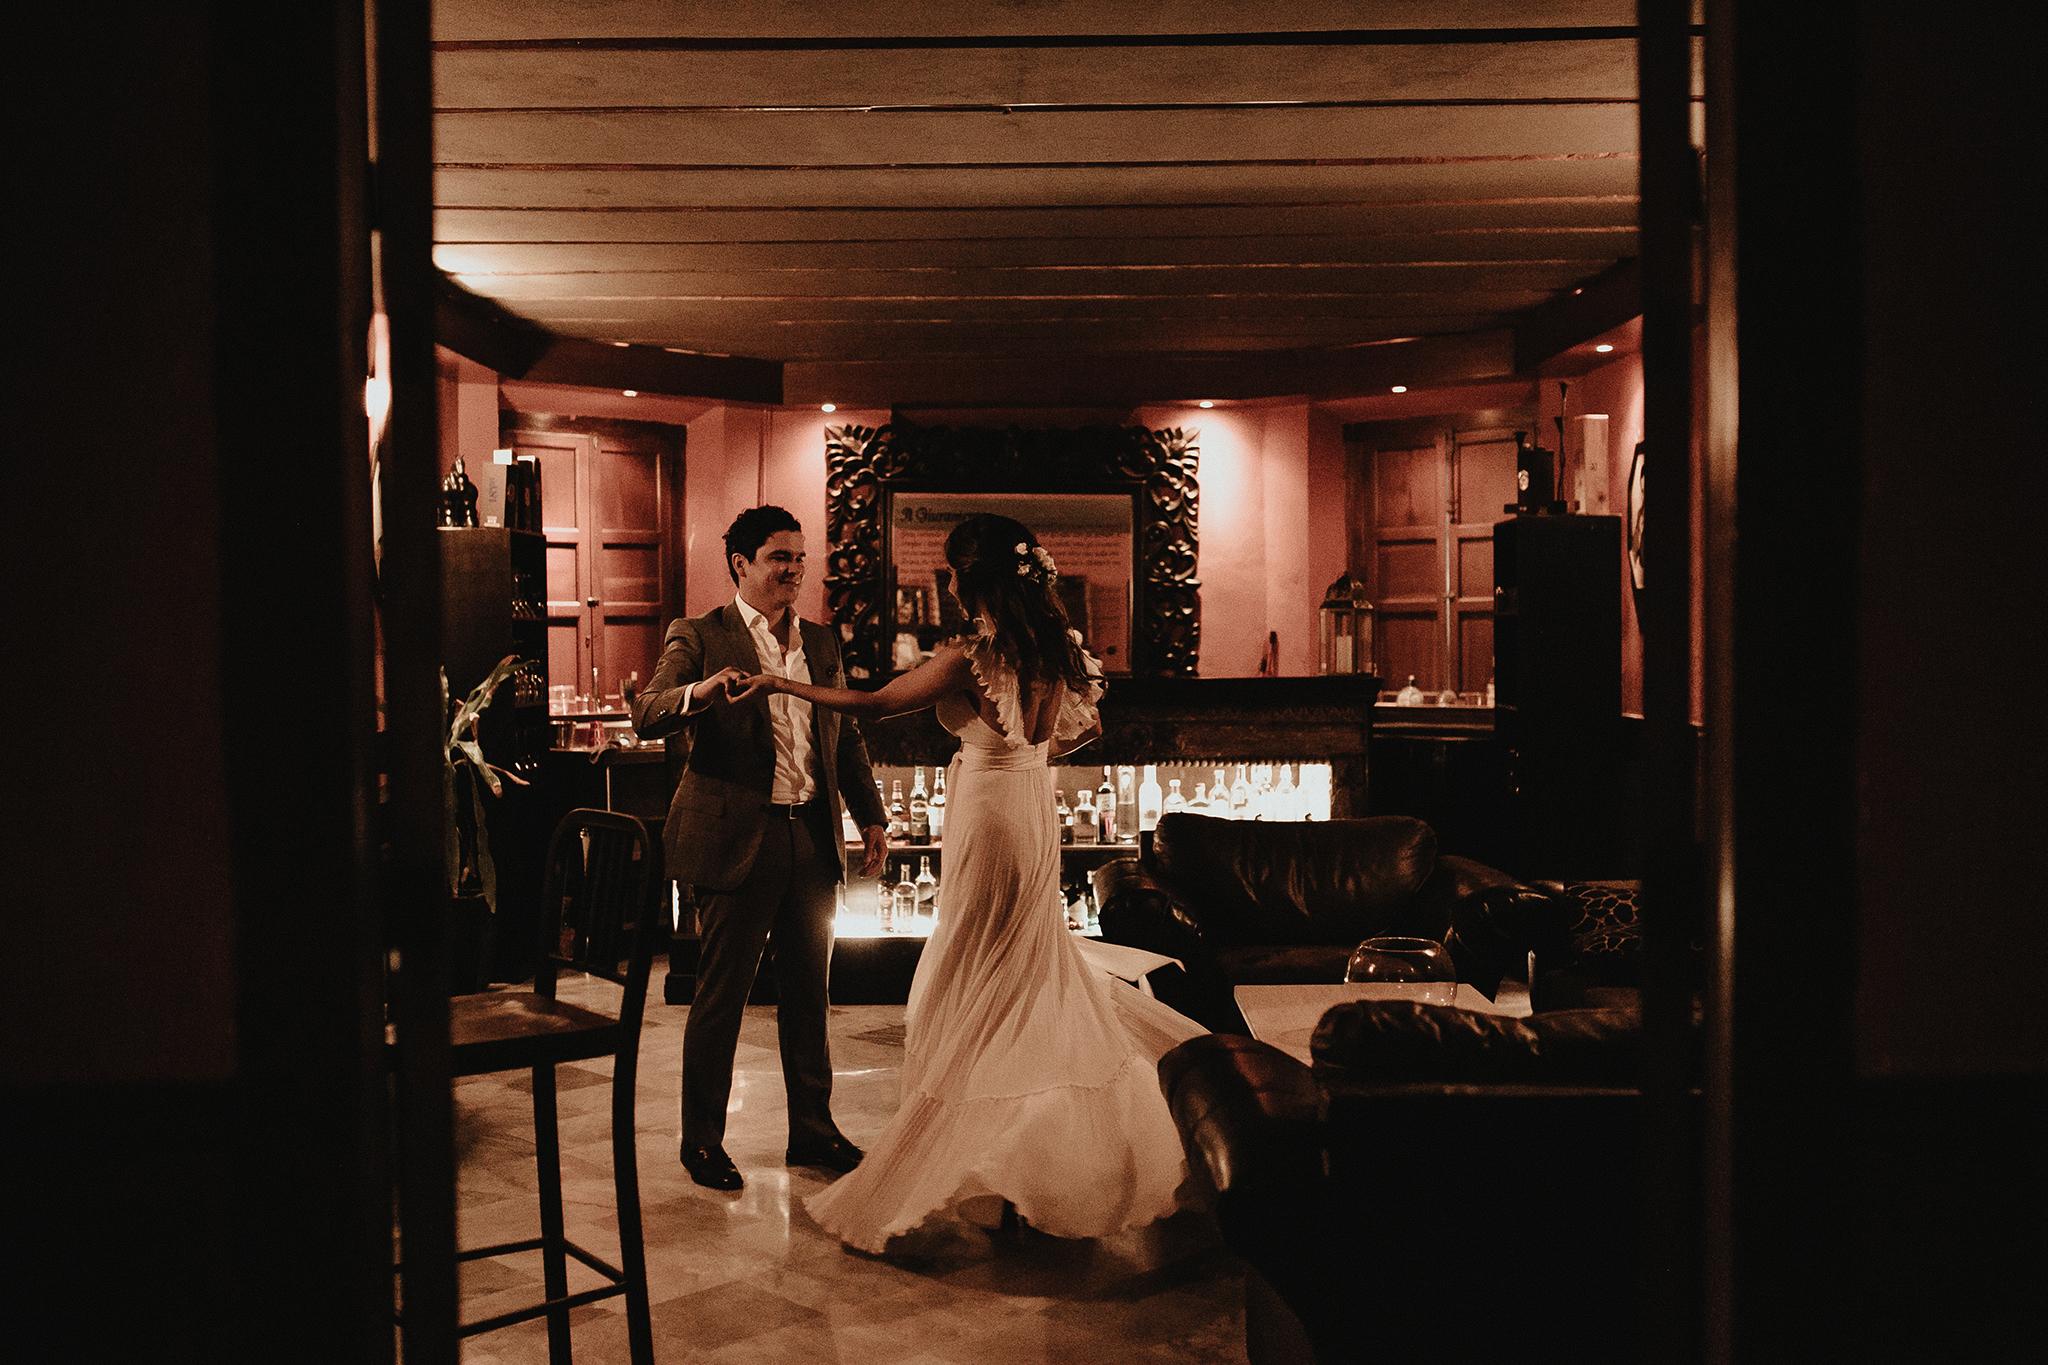 0071civil_Hacienda_WeddingDstination_MeridaYucatan_HaciendasMerida_BodasMexico_BodasYucatan_Boda_Destino.jpg